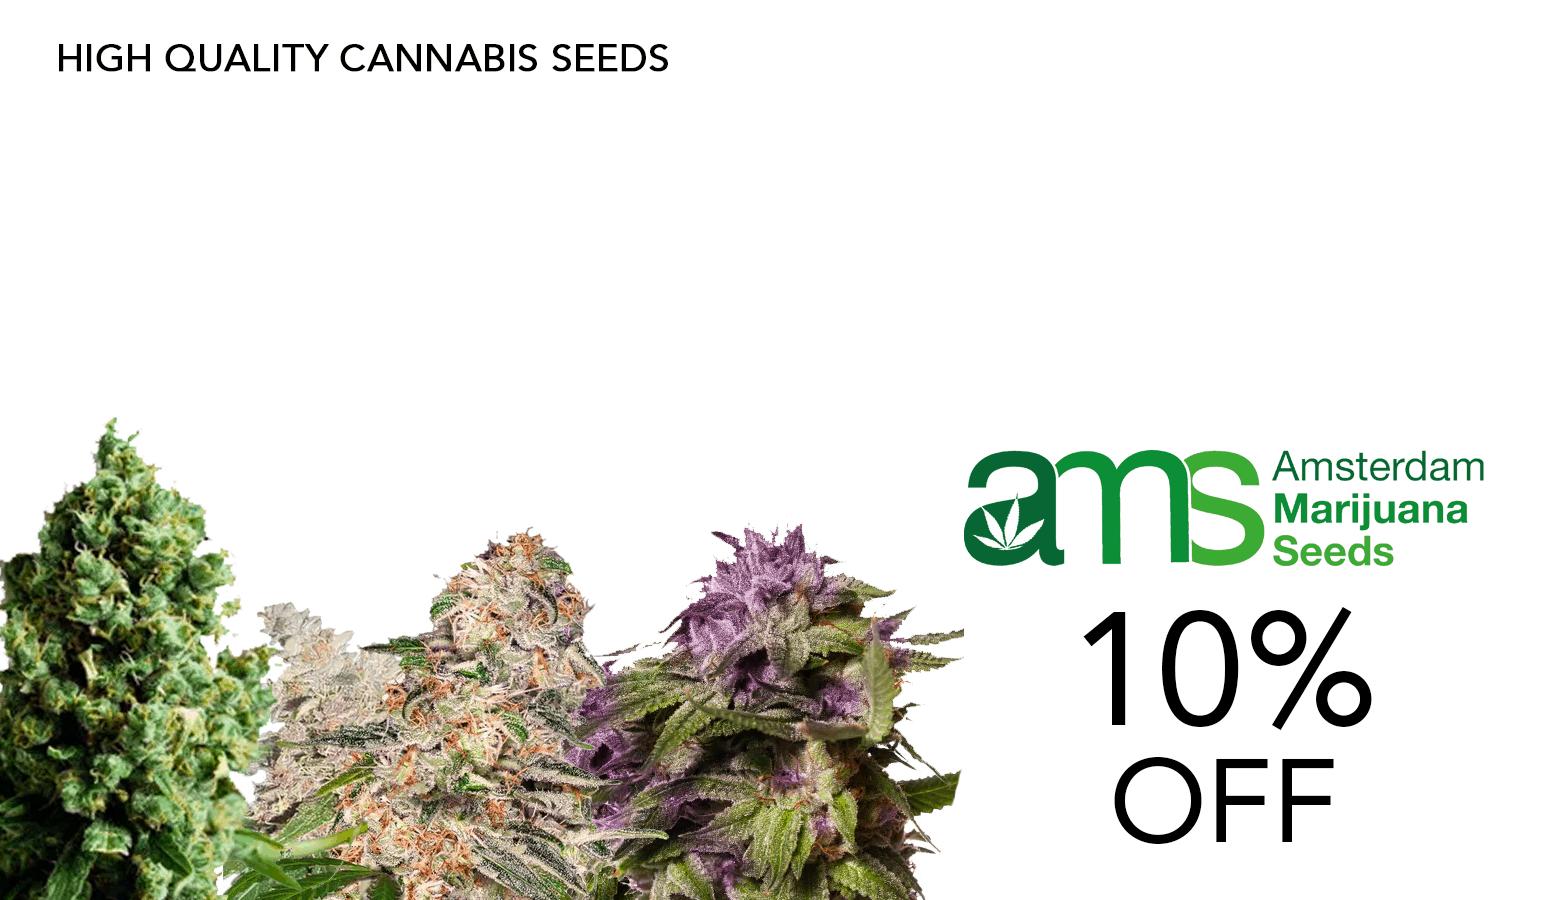 Amsterdam Marijuana Seeds Coupon Code Offer Website